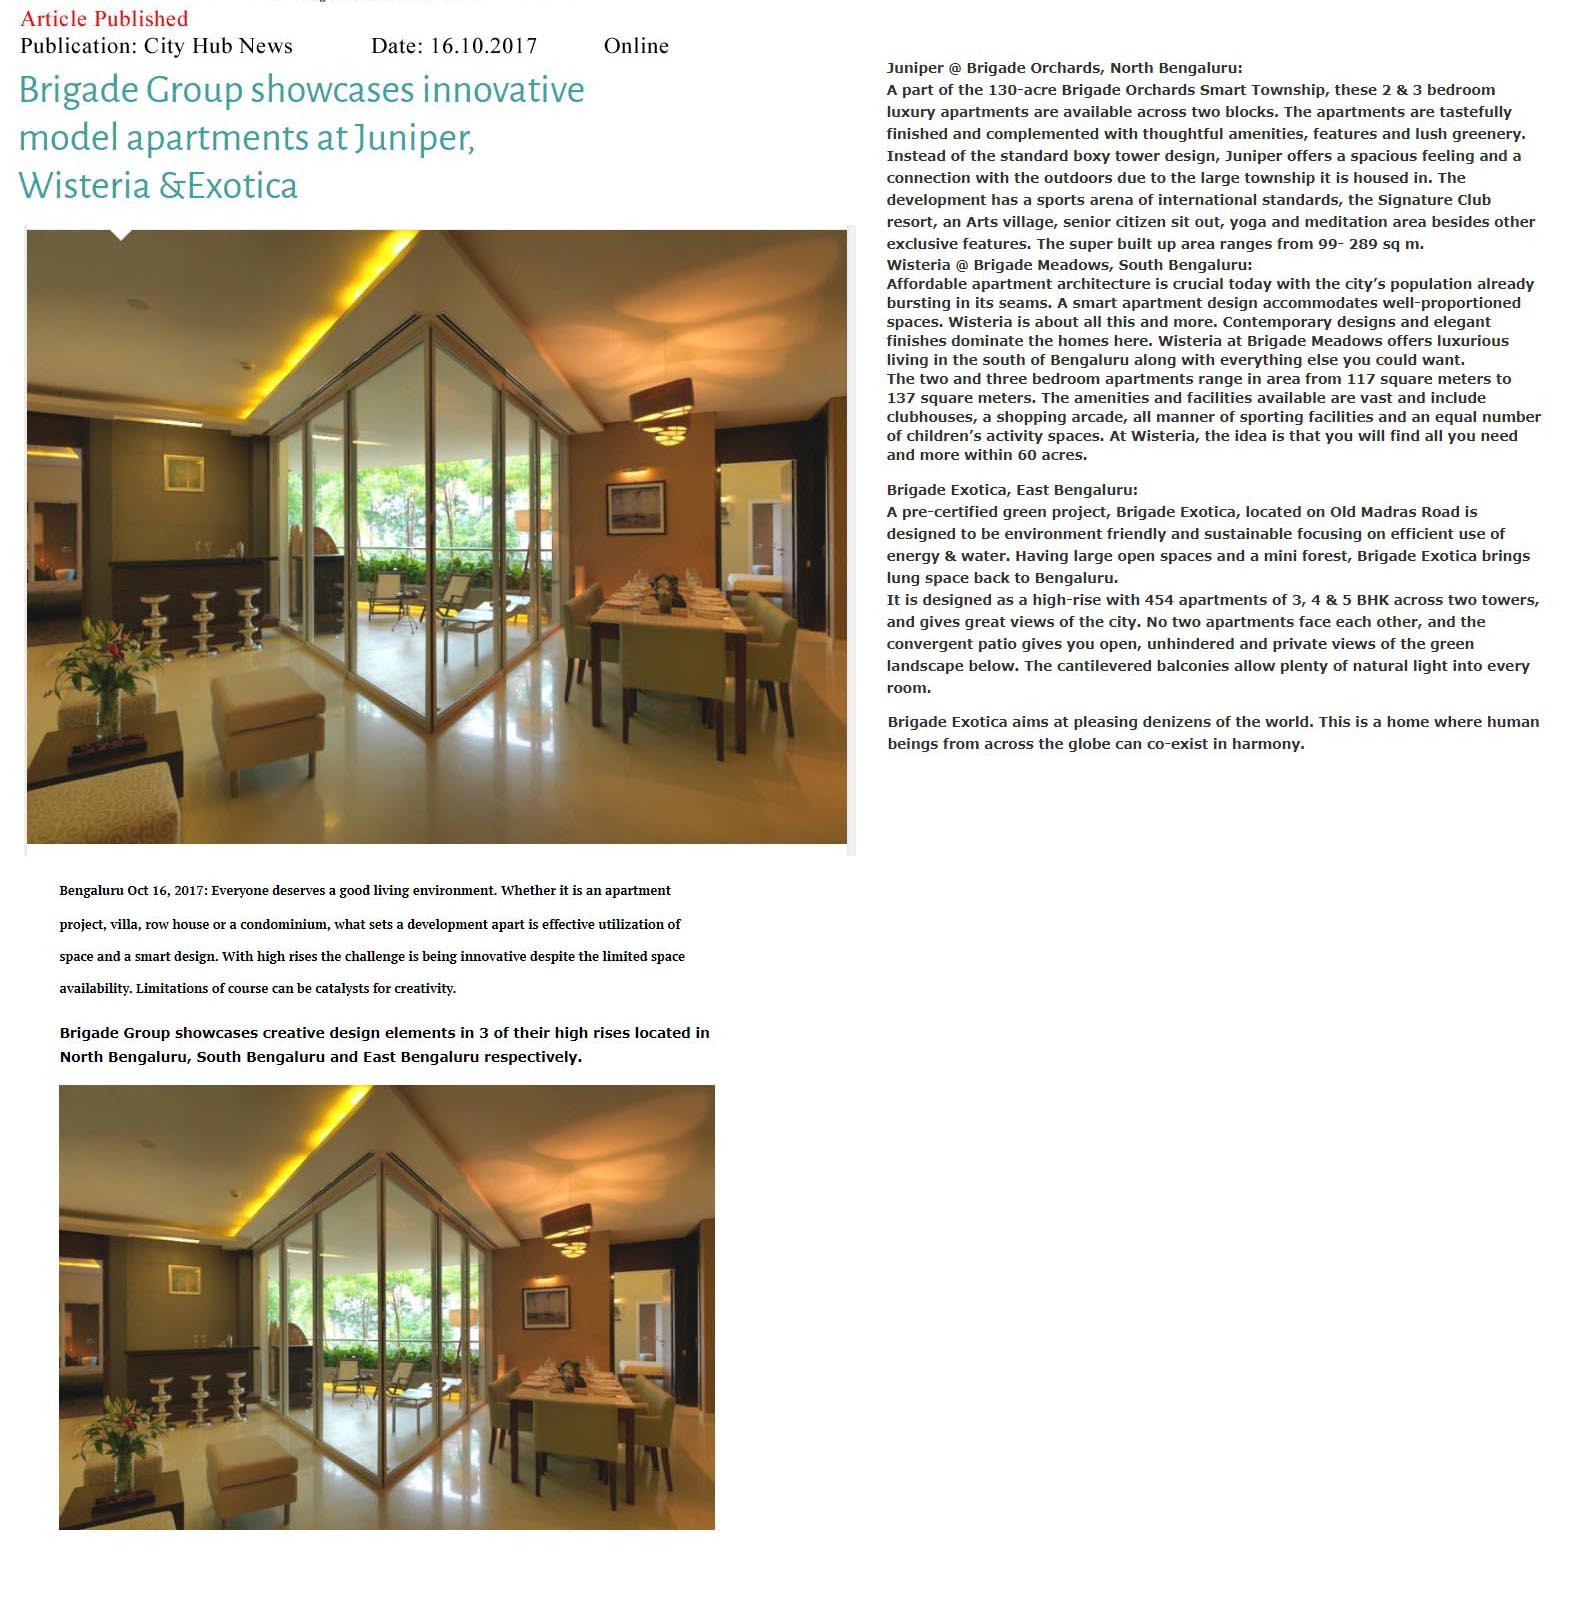 Brigade Group showcased innovative model apartments at Juniper, Wisteria & Exotica—City Hub News-Online